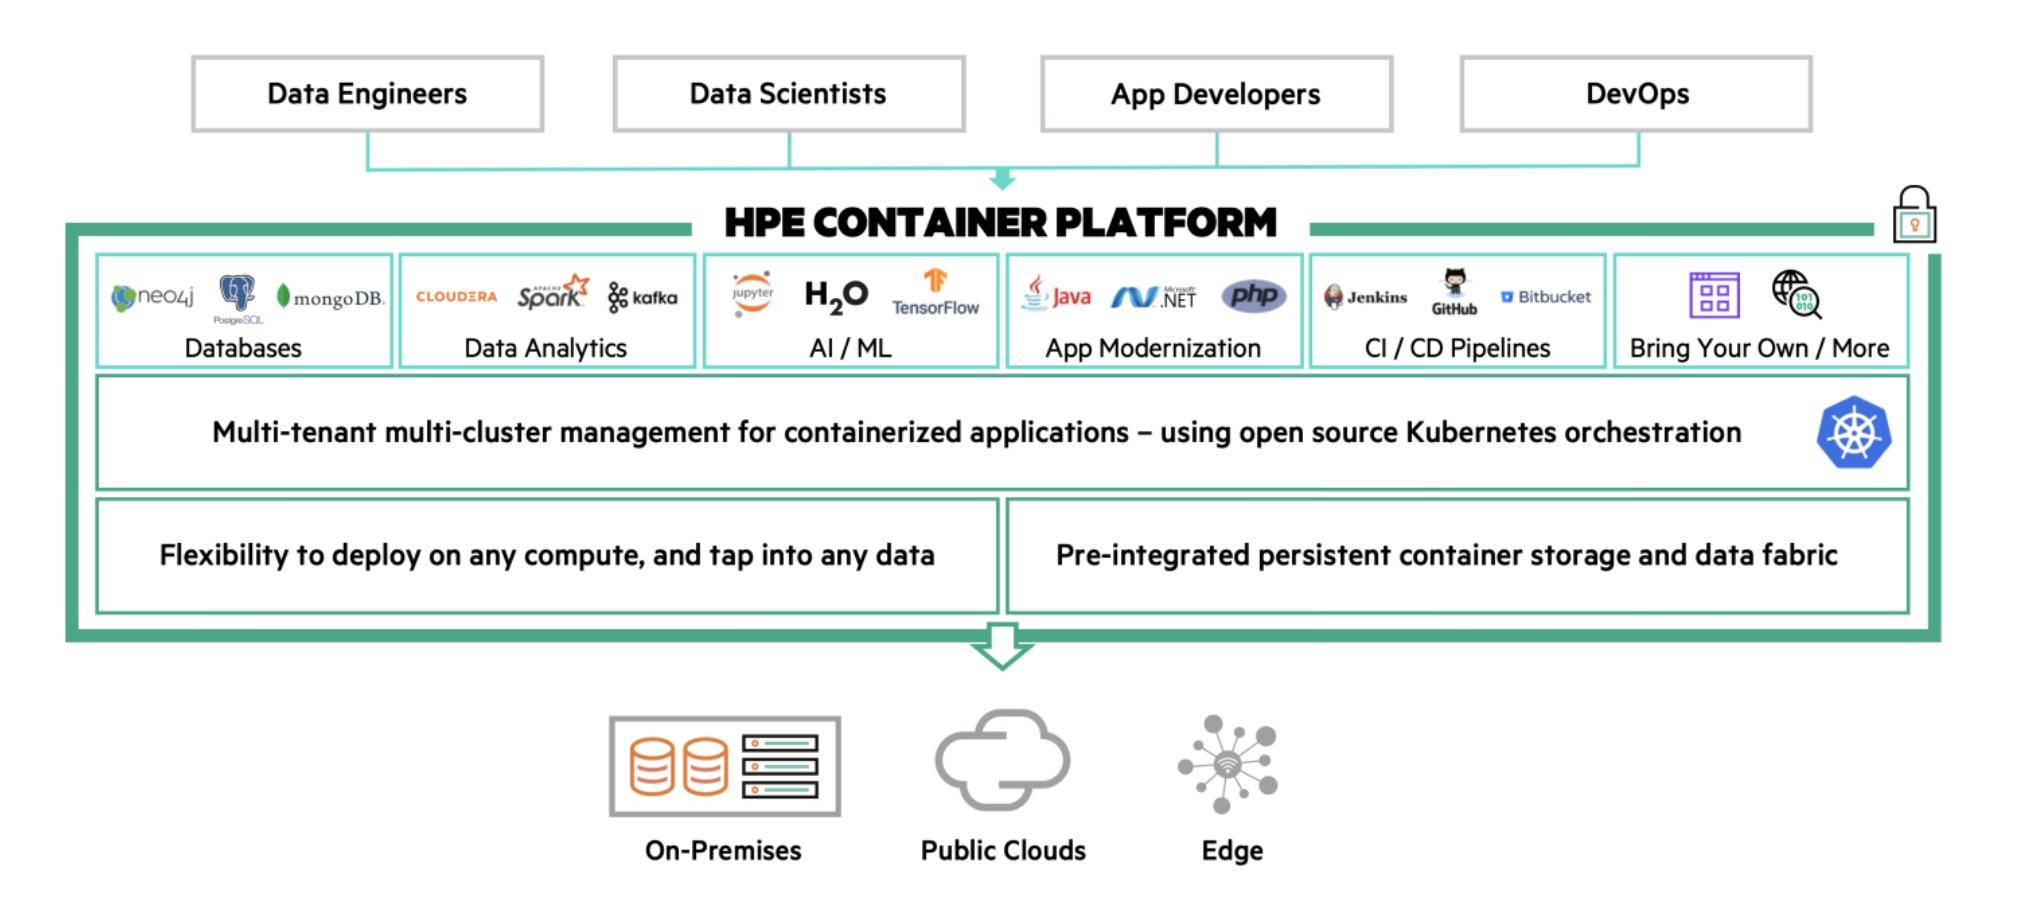 HPE представила универсальную контейнерную платформу для предприятий